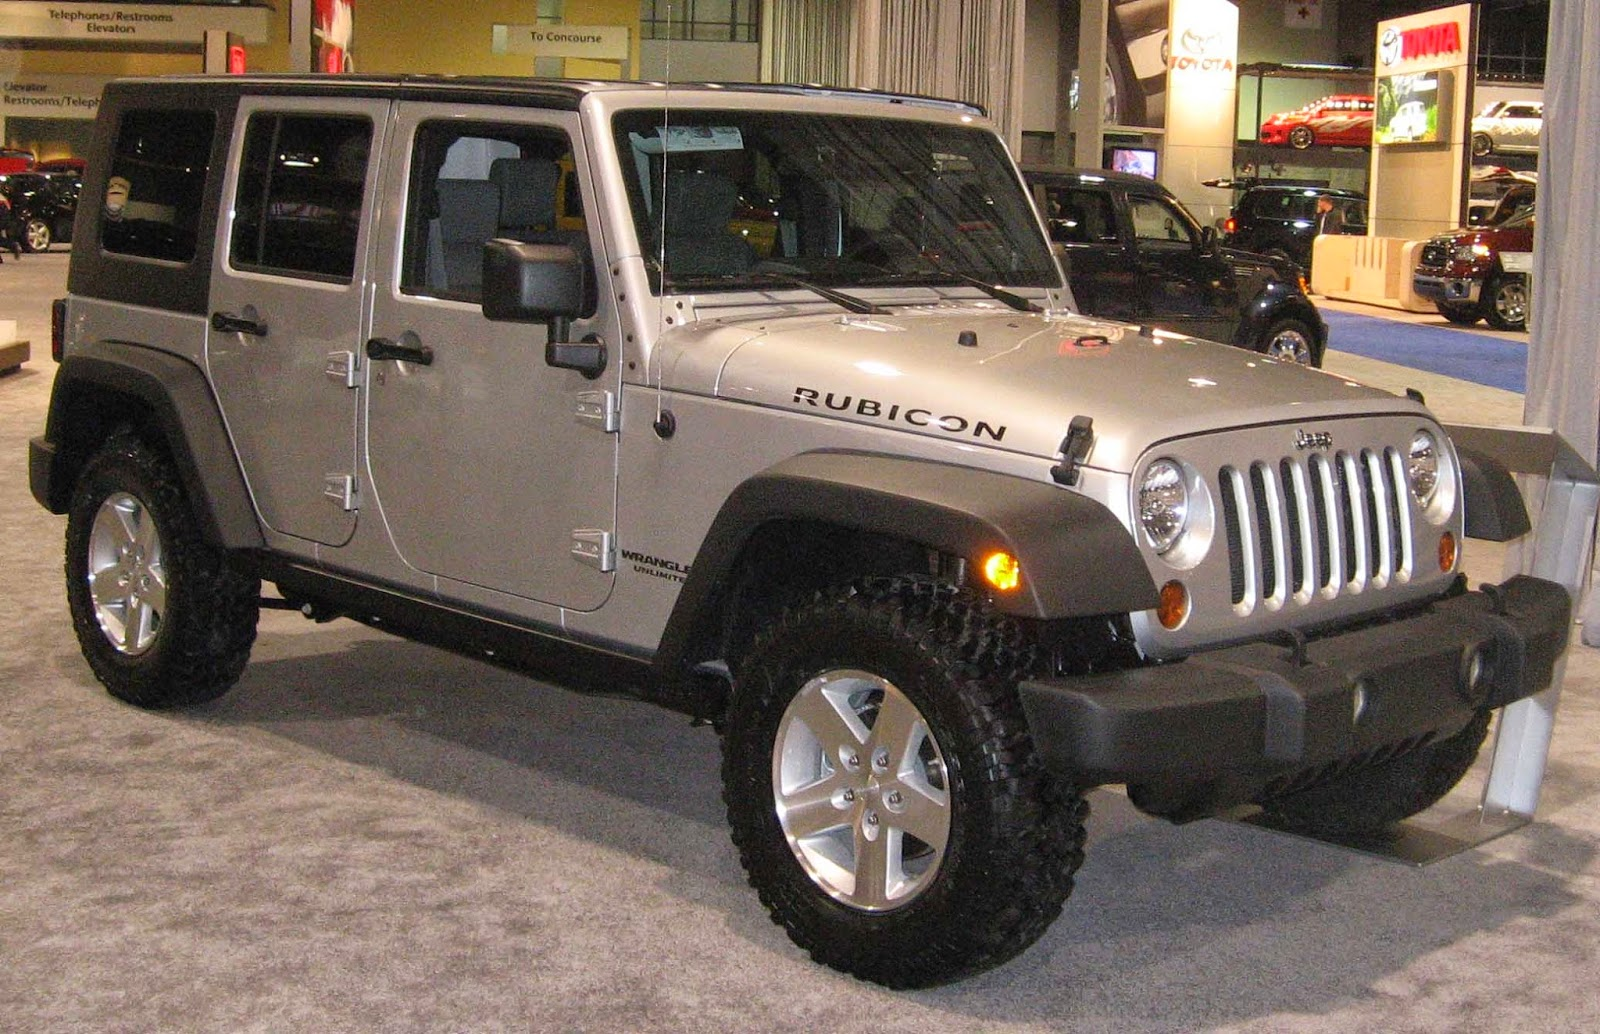 cover ban serep jeep rubicon